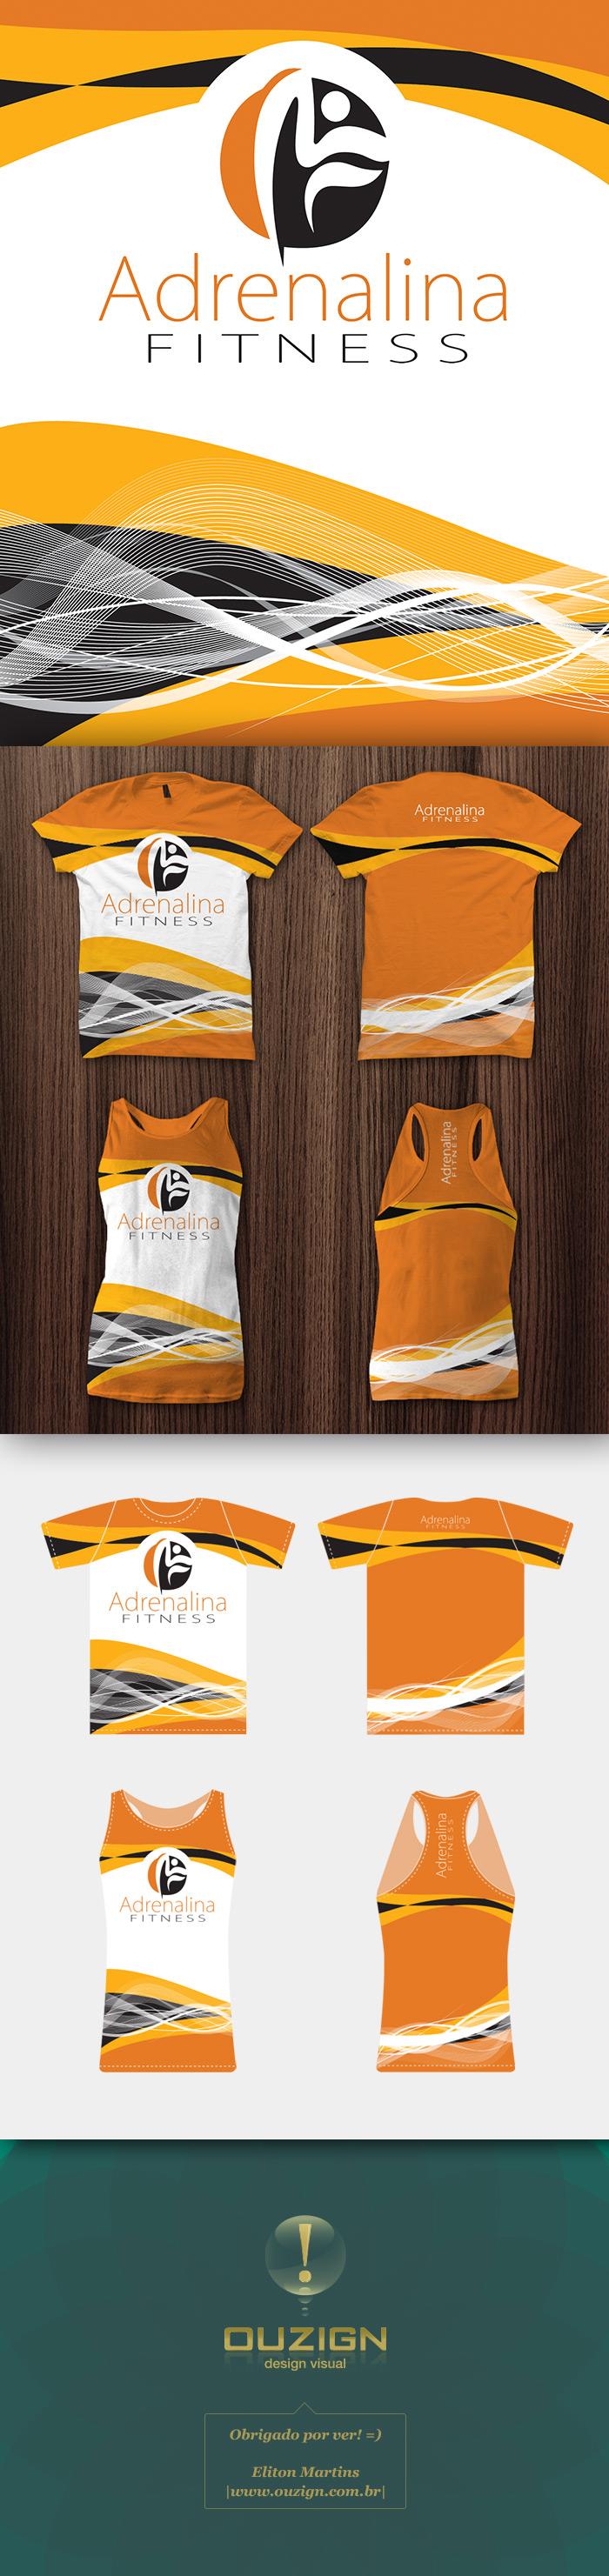 Camisetas - Adrenalina Fitness (1)